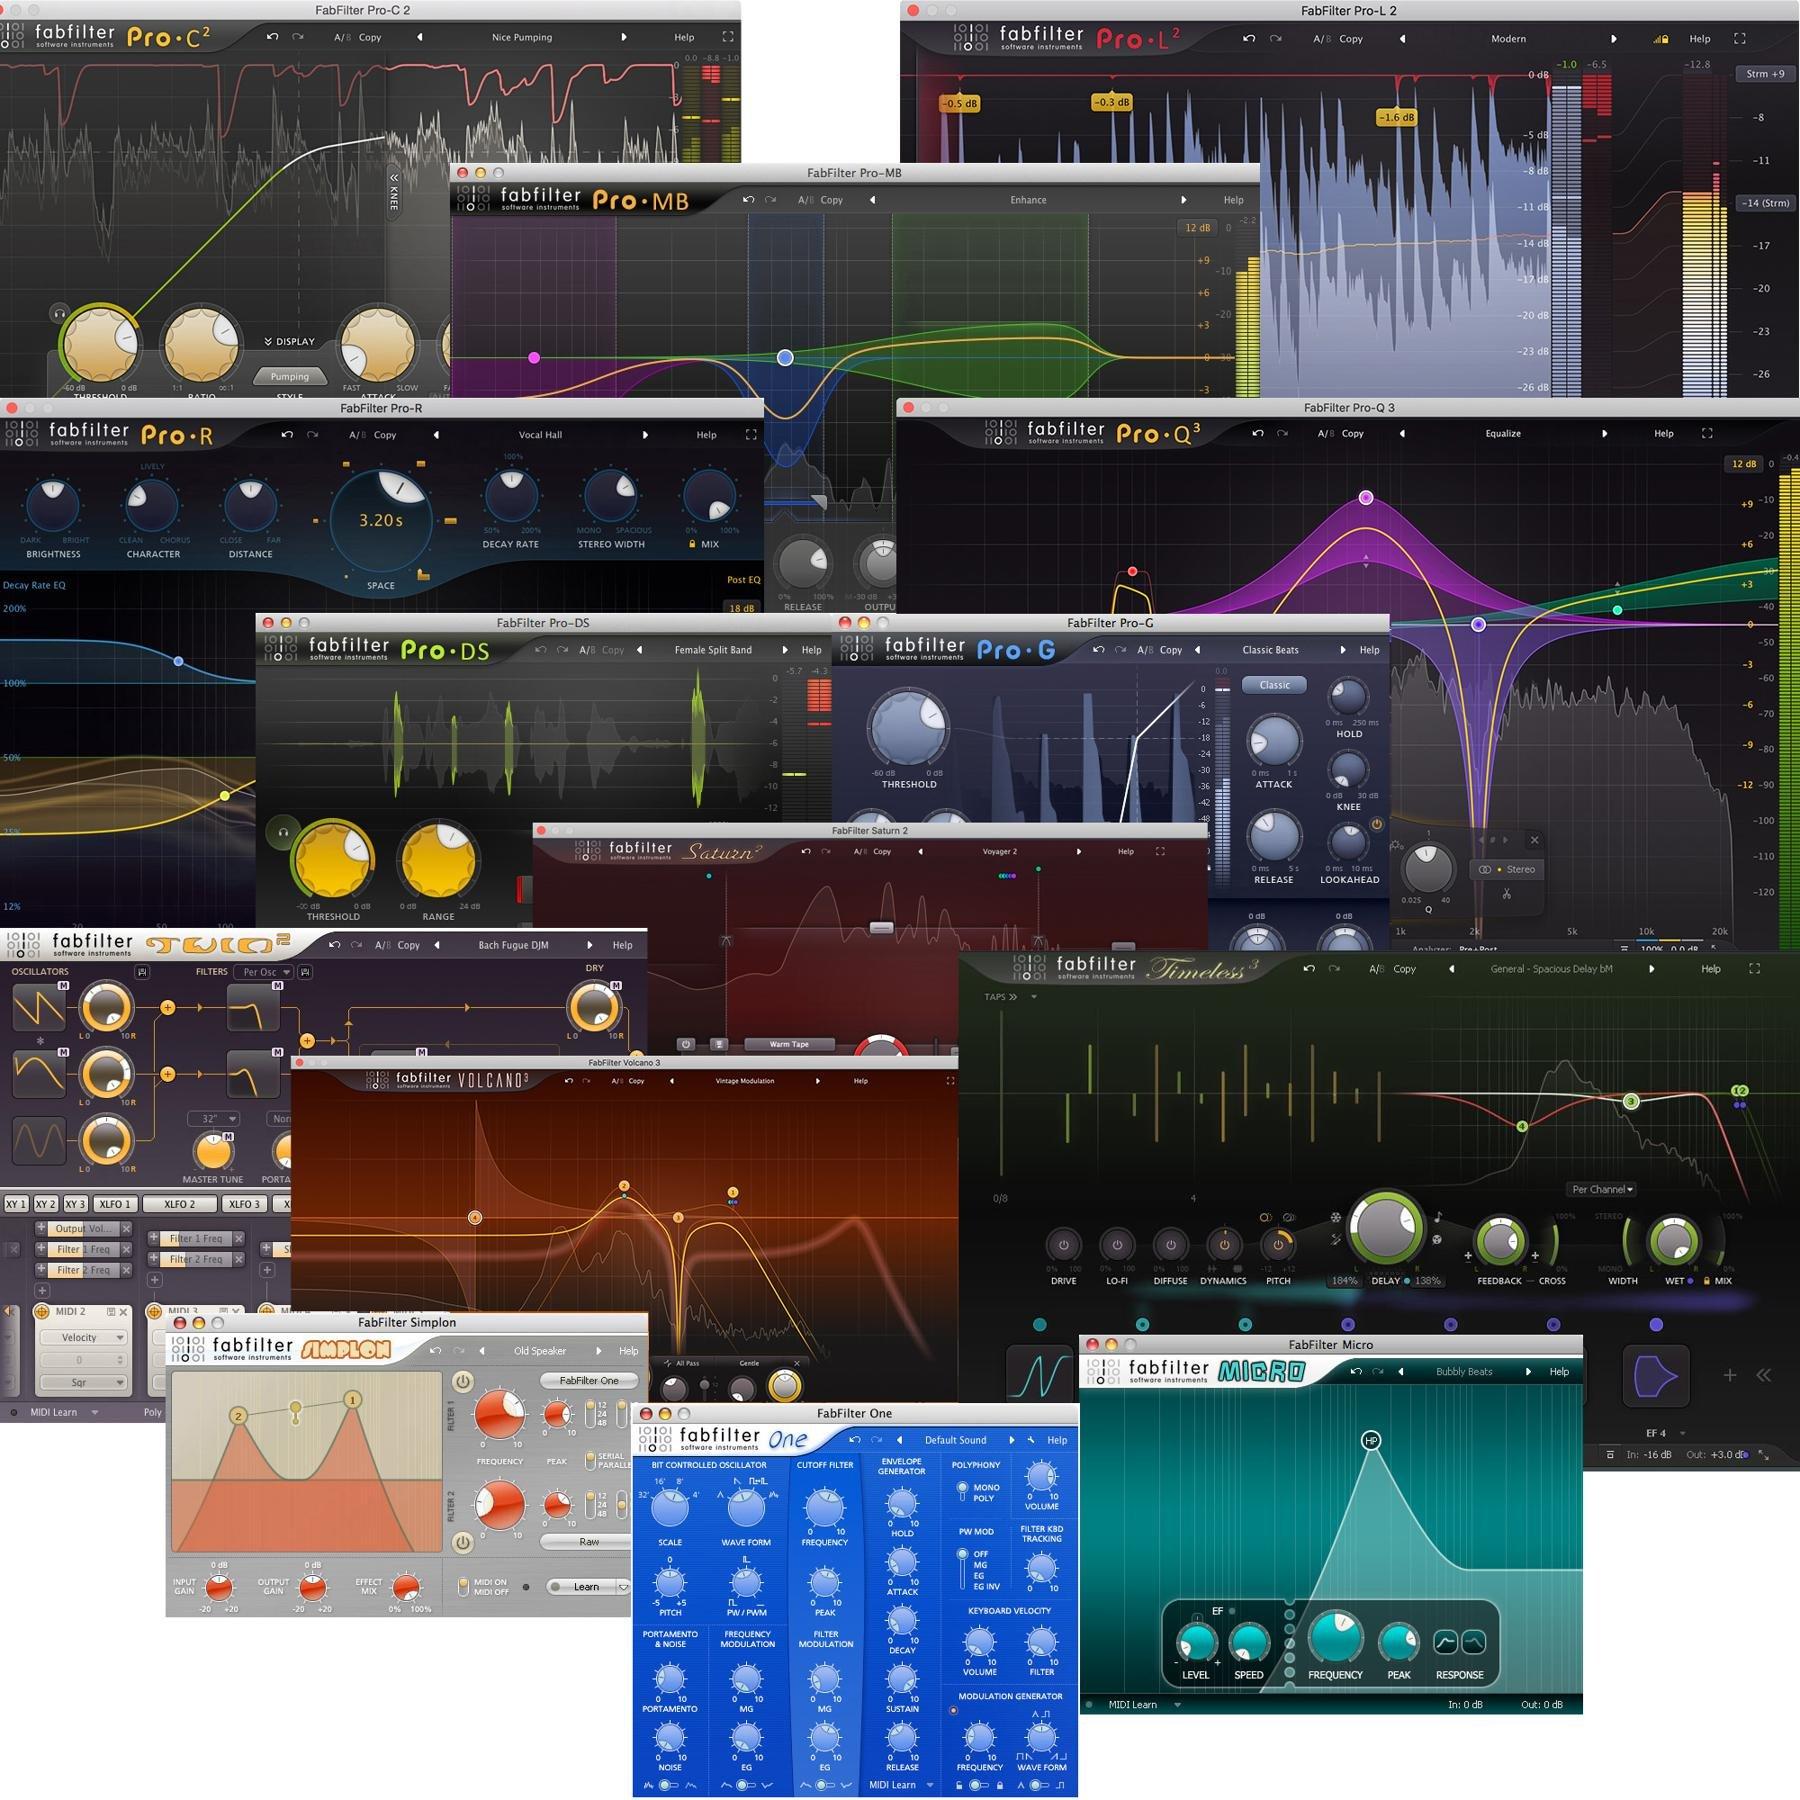 Vocalign Pro 4 Serial - livinlawyer